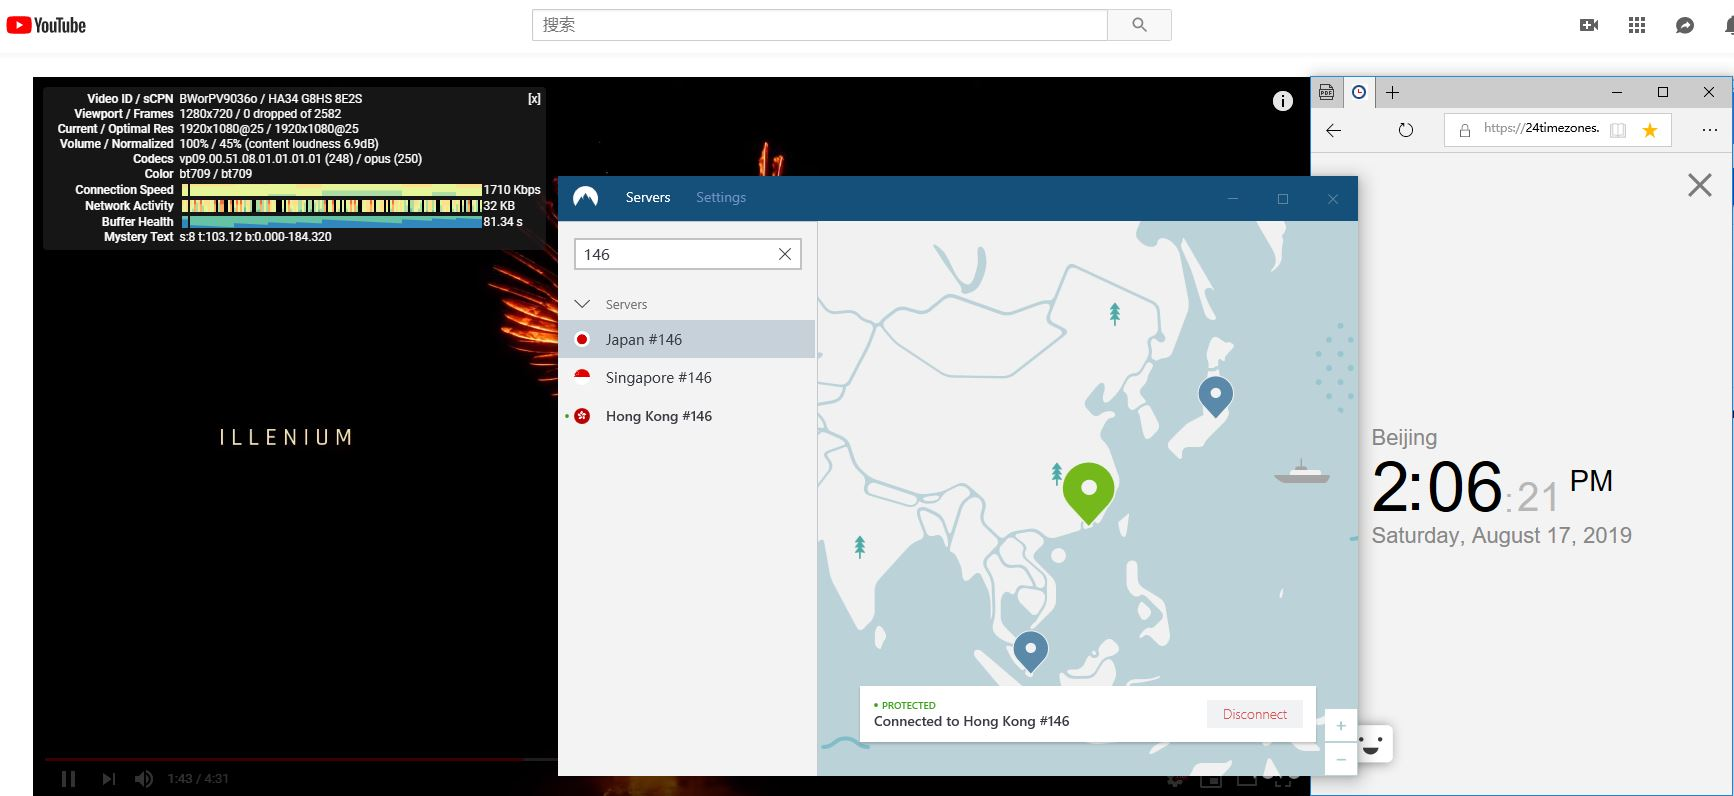 windows NordVPN UDP协议 香港146服务器 中国翻墙 科学上网 YouTube测速-20190817